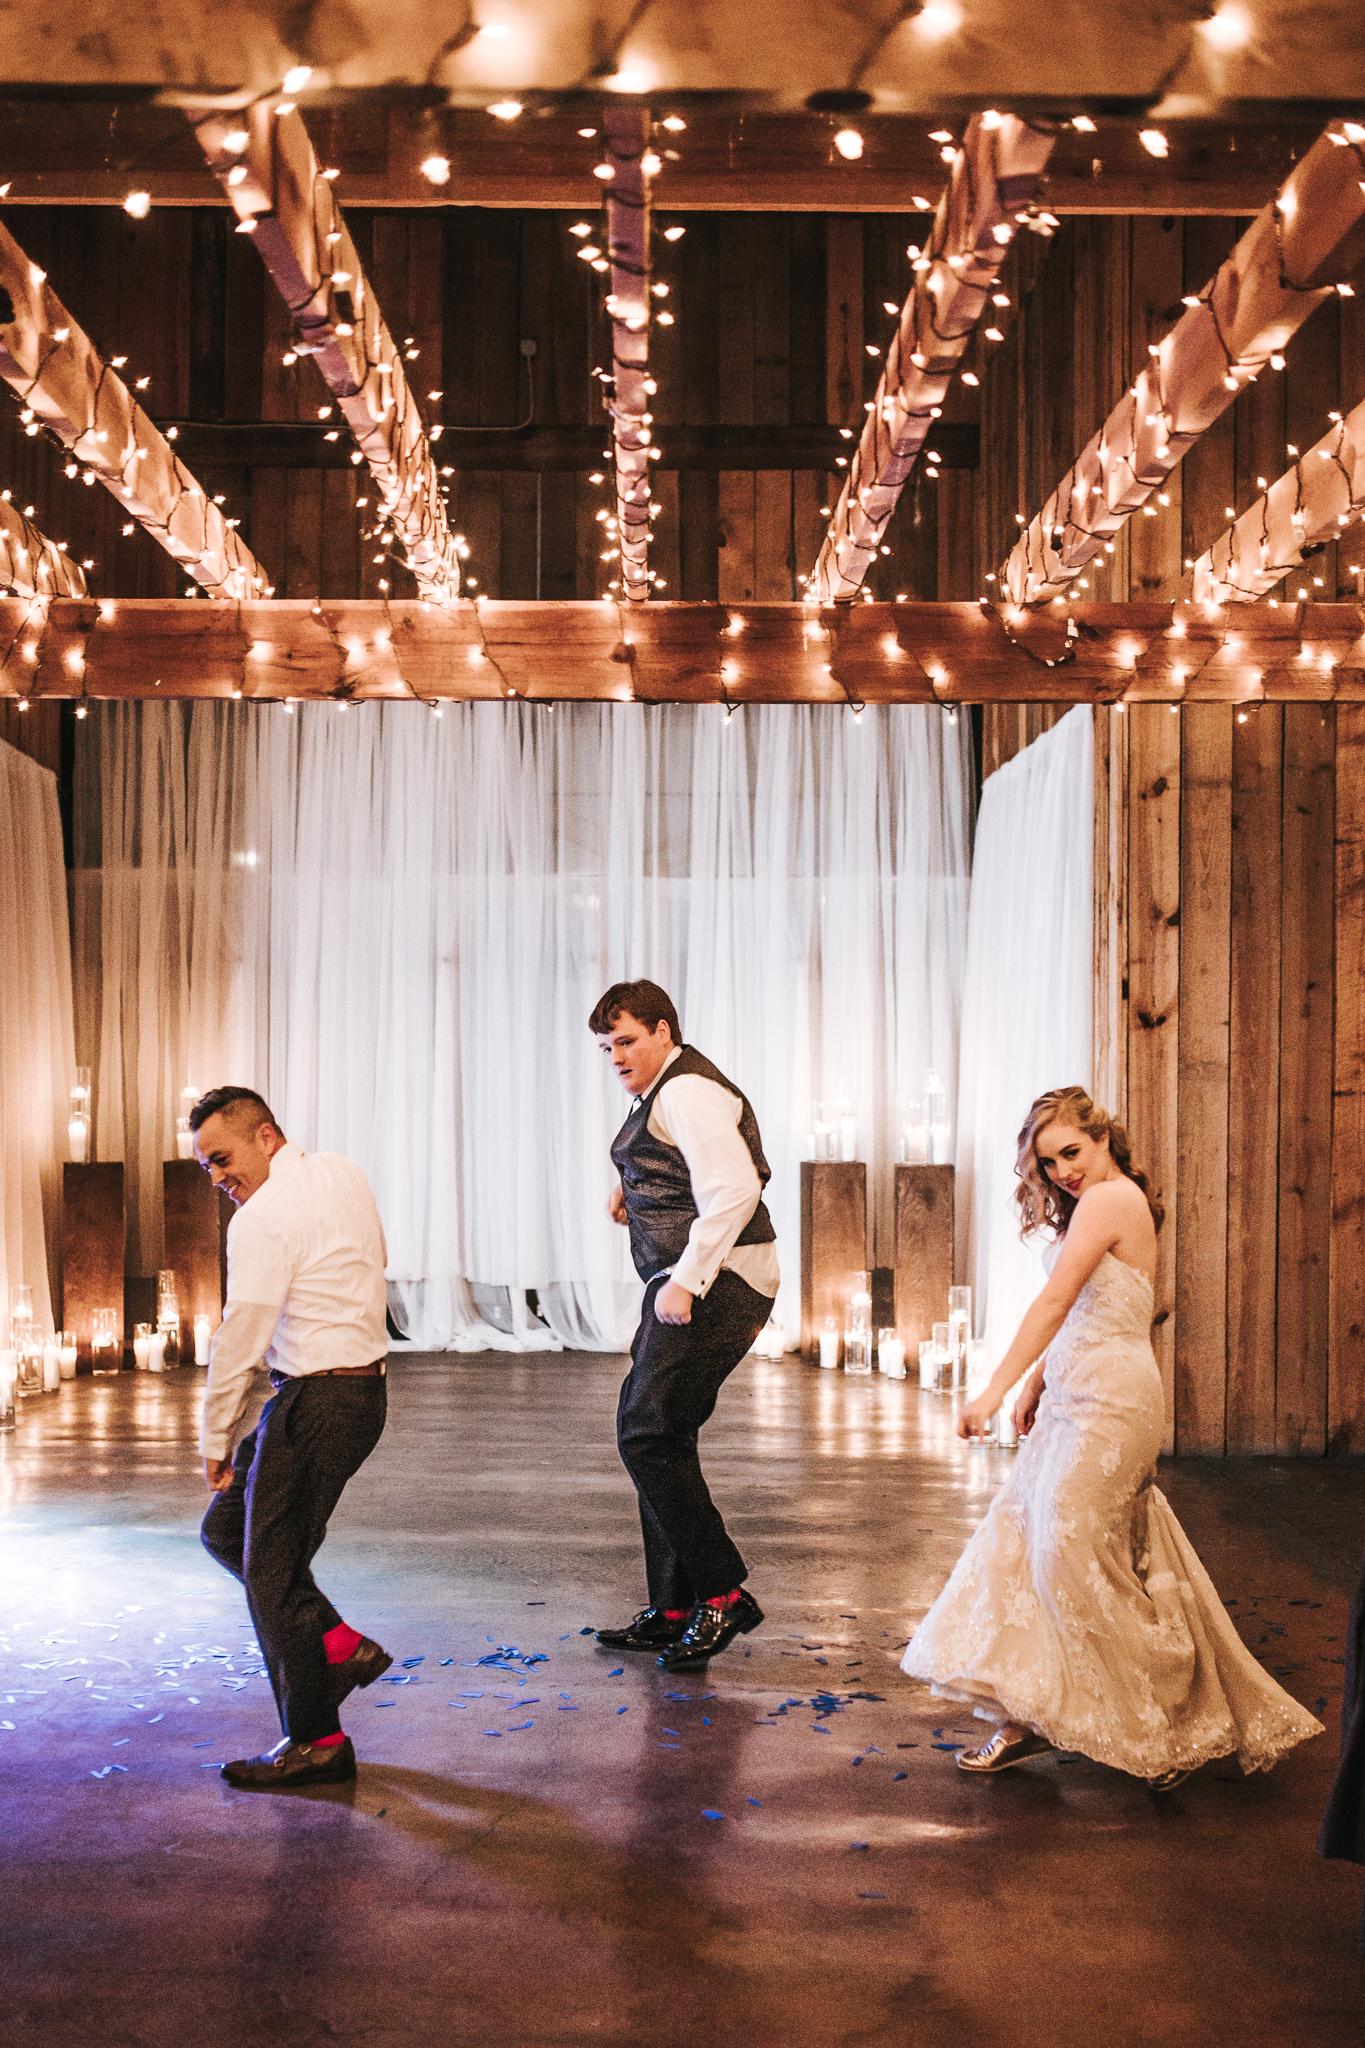 0172 Ariana Jordan Photo - Cameron & Lauren's Wedding at Talon Winery  7783.jpg